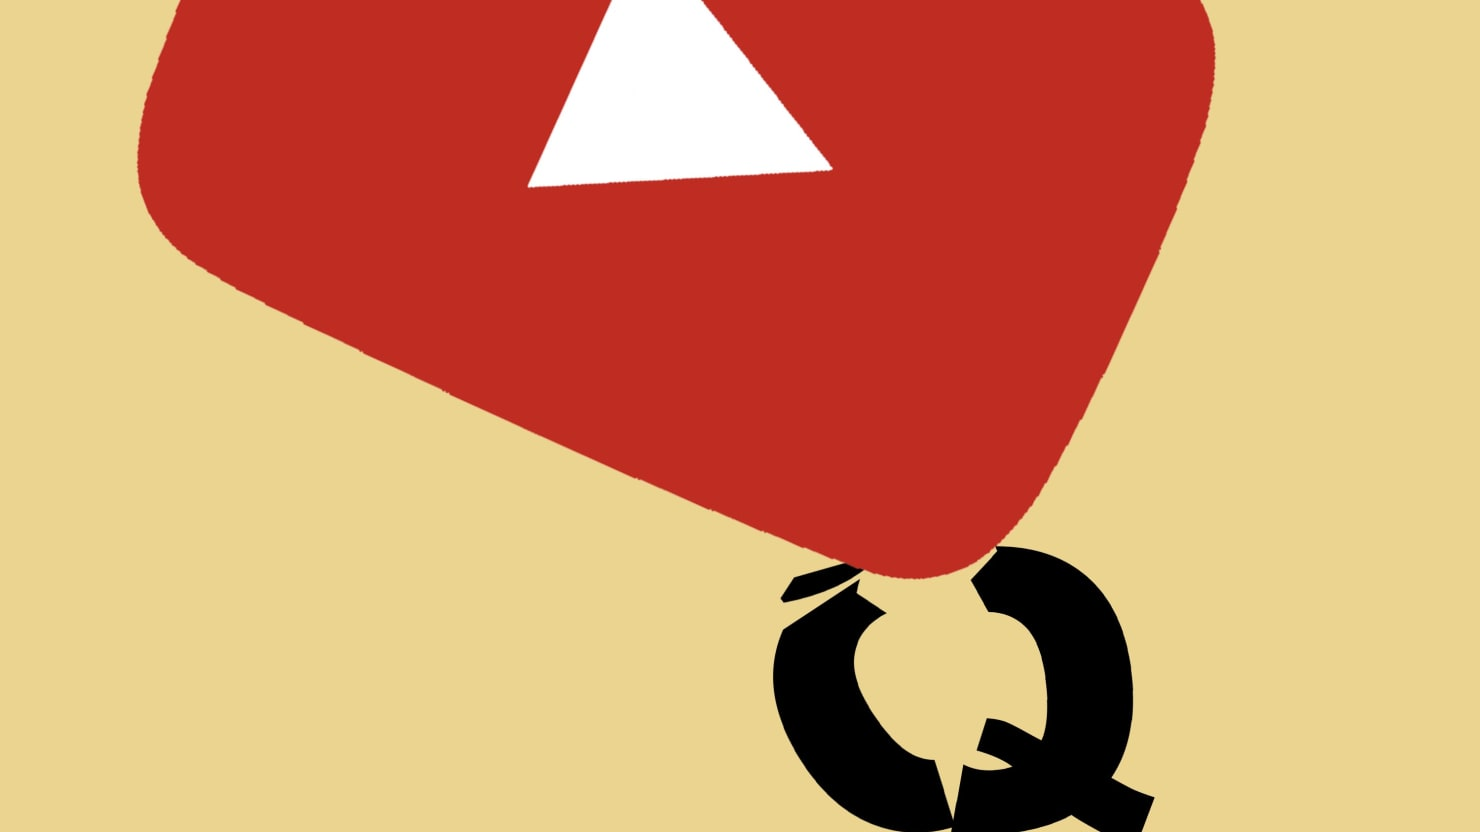 YouTube Launches Major New Crackdown on QAnon